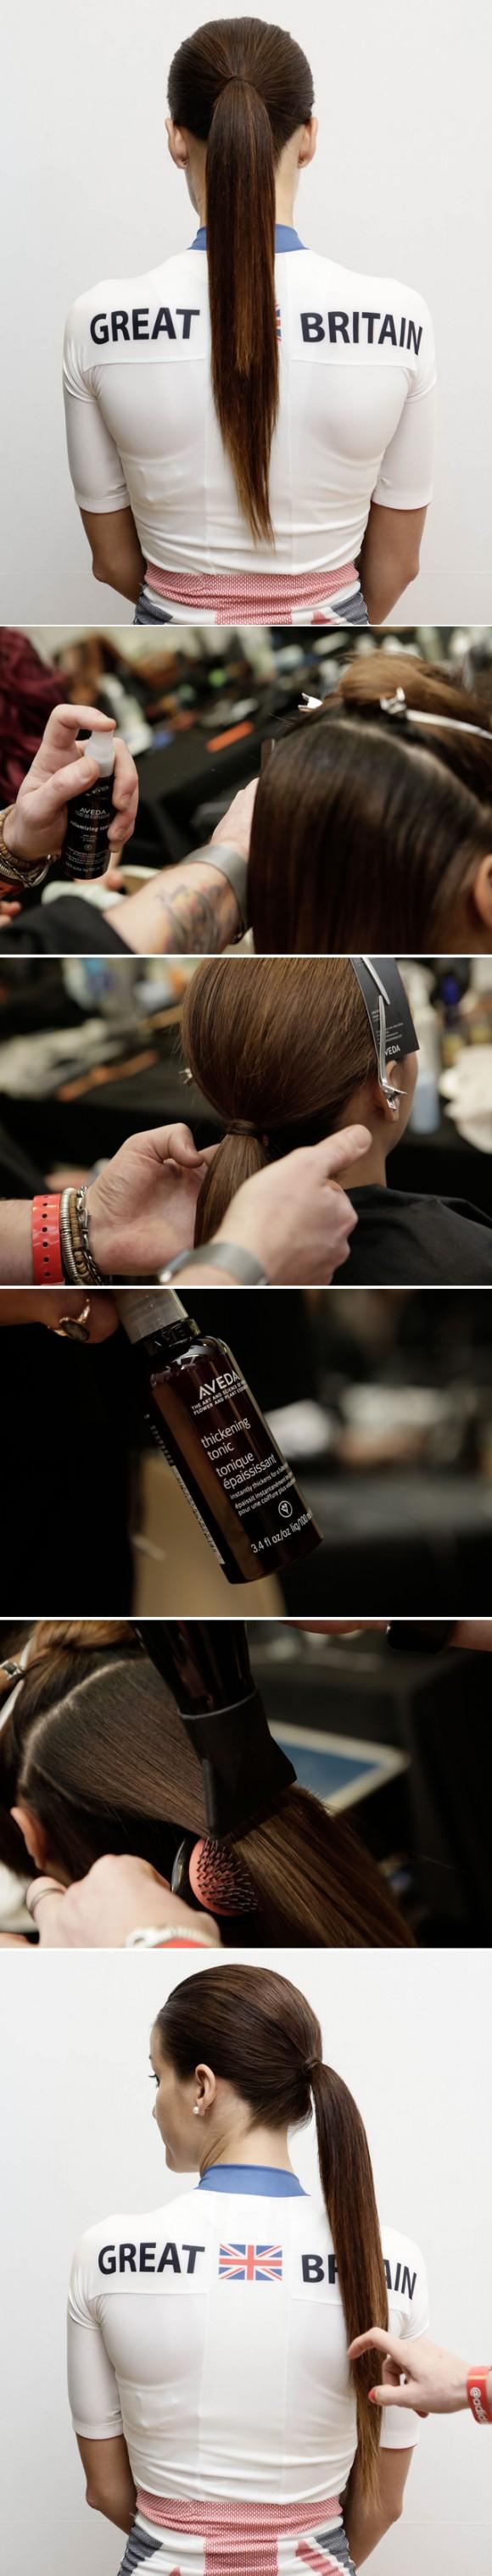 Langt hår, lange bryster og award-vindere | Beautyspace